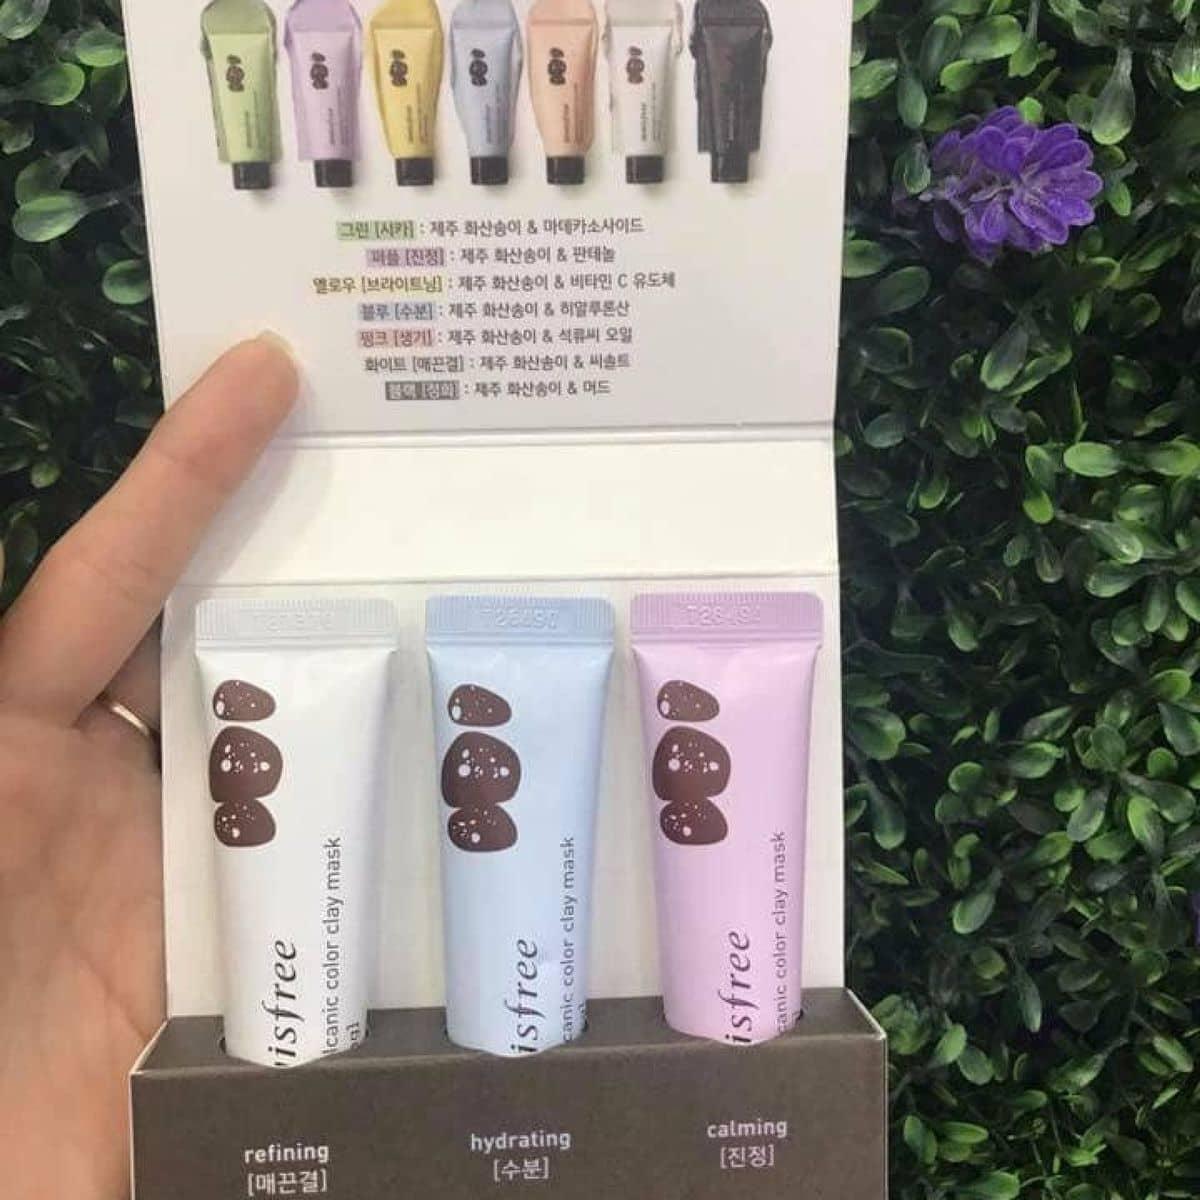 Energizing Kit Jeju Volcanic Color Clay Mask Daftar Harga Terbaru Innisfree Refining 70ml Set 3 Mt N White